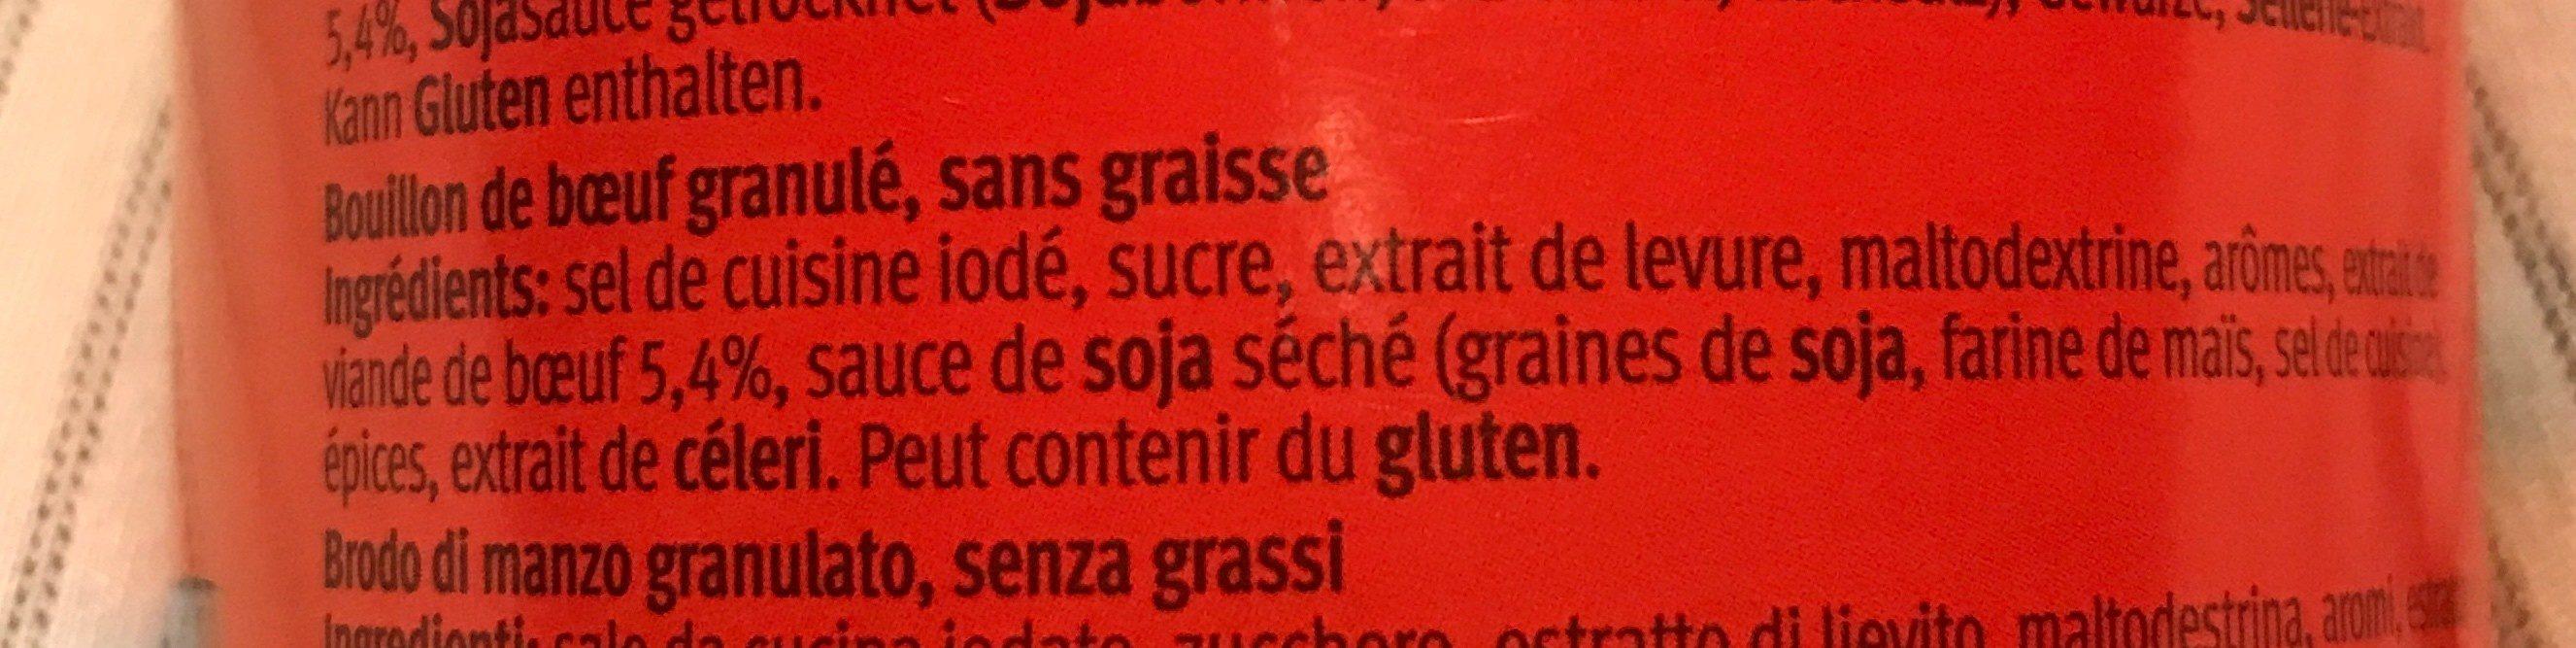 Bouillon Rind-de boeuf di manzo - Ingredients - fr